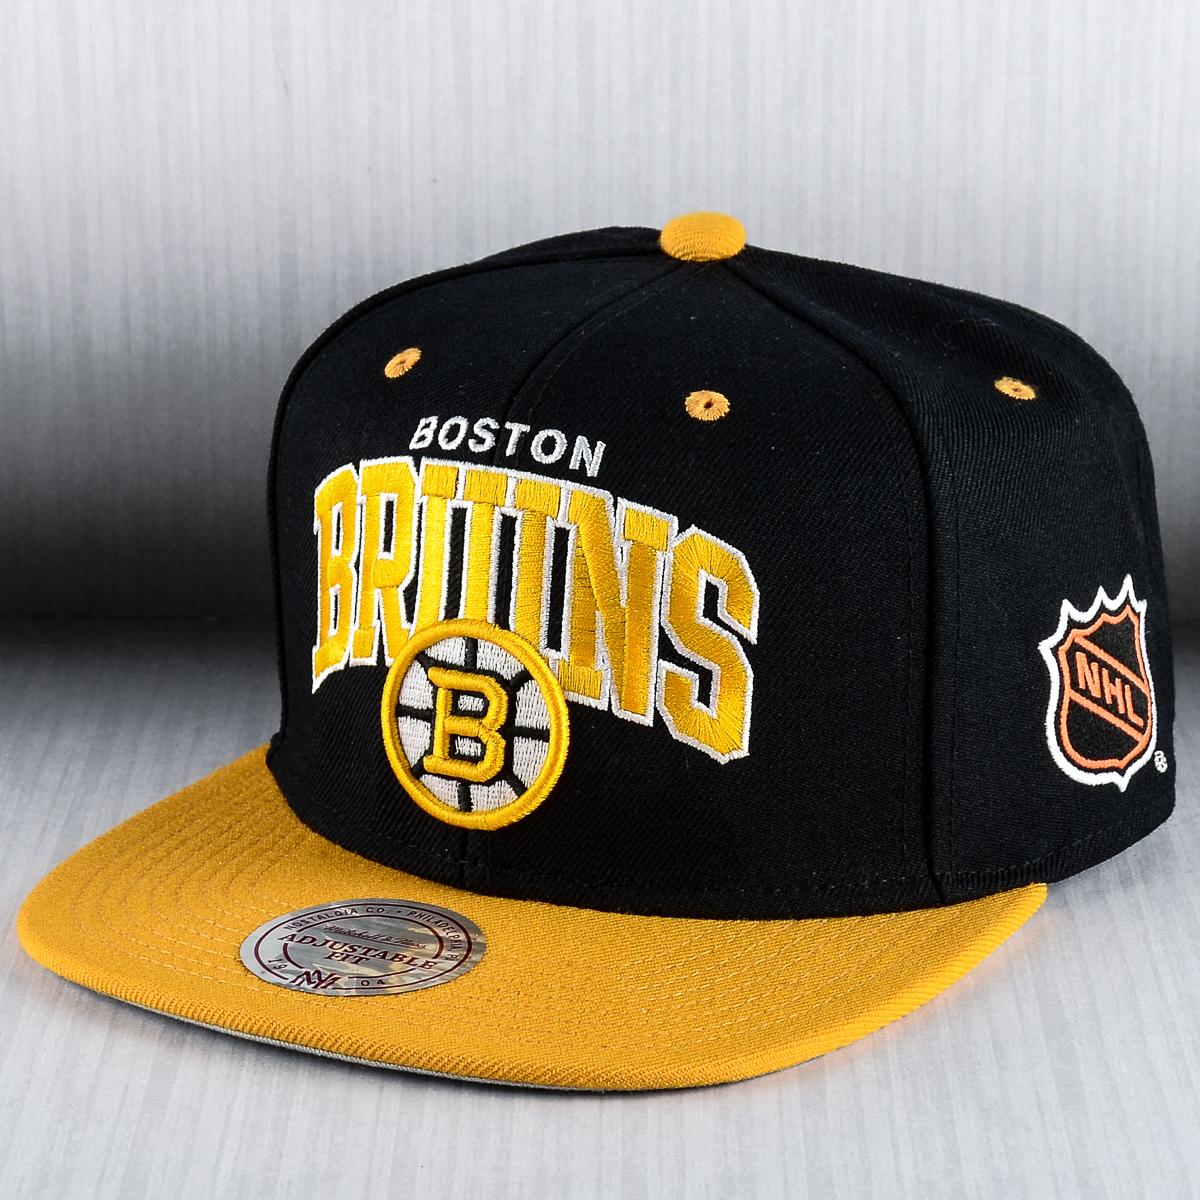 5f074f0a78c Mitchell   Ness NHL Boston Bruins Team Arch Snapback Cap - MLB NFL ...